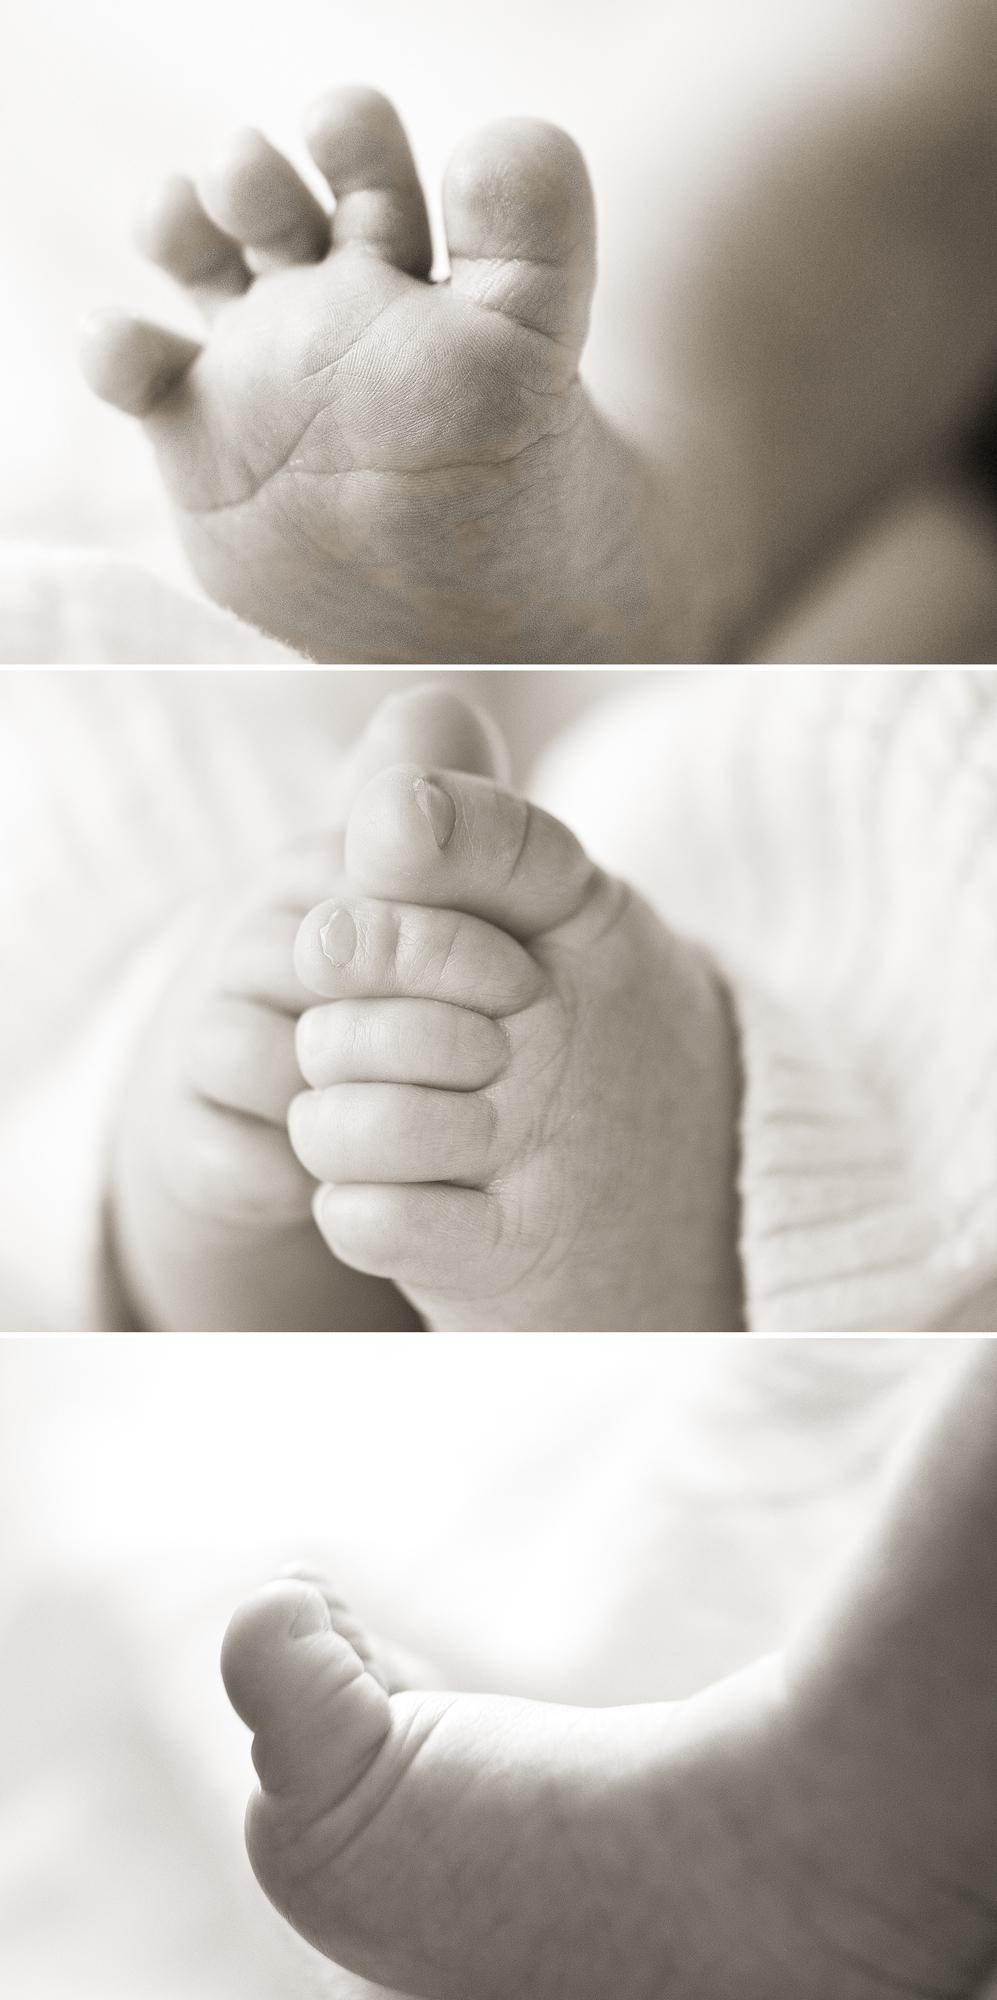 tiny feet_1.jpg